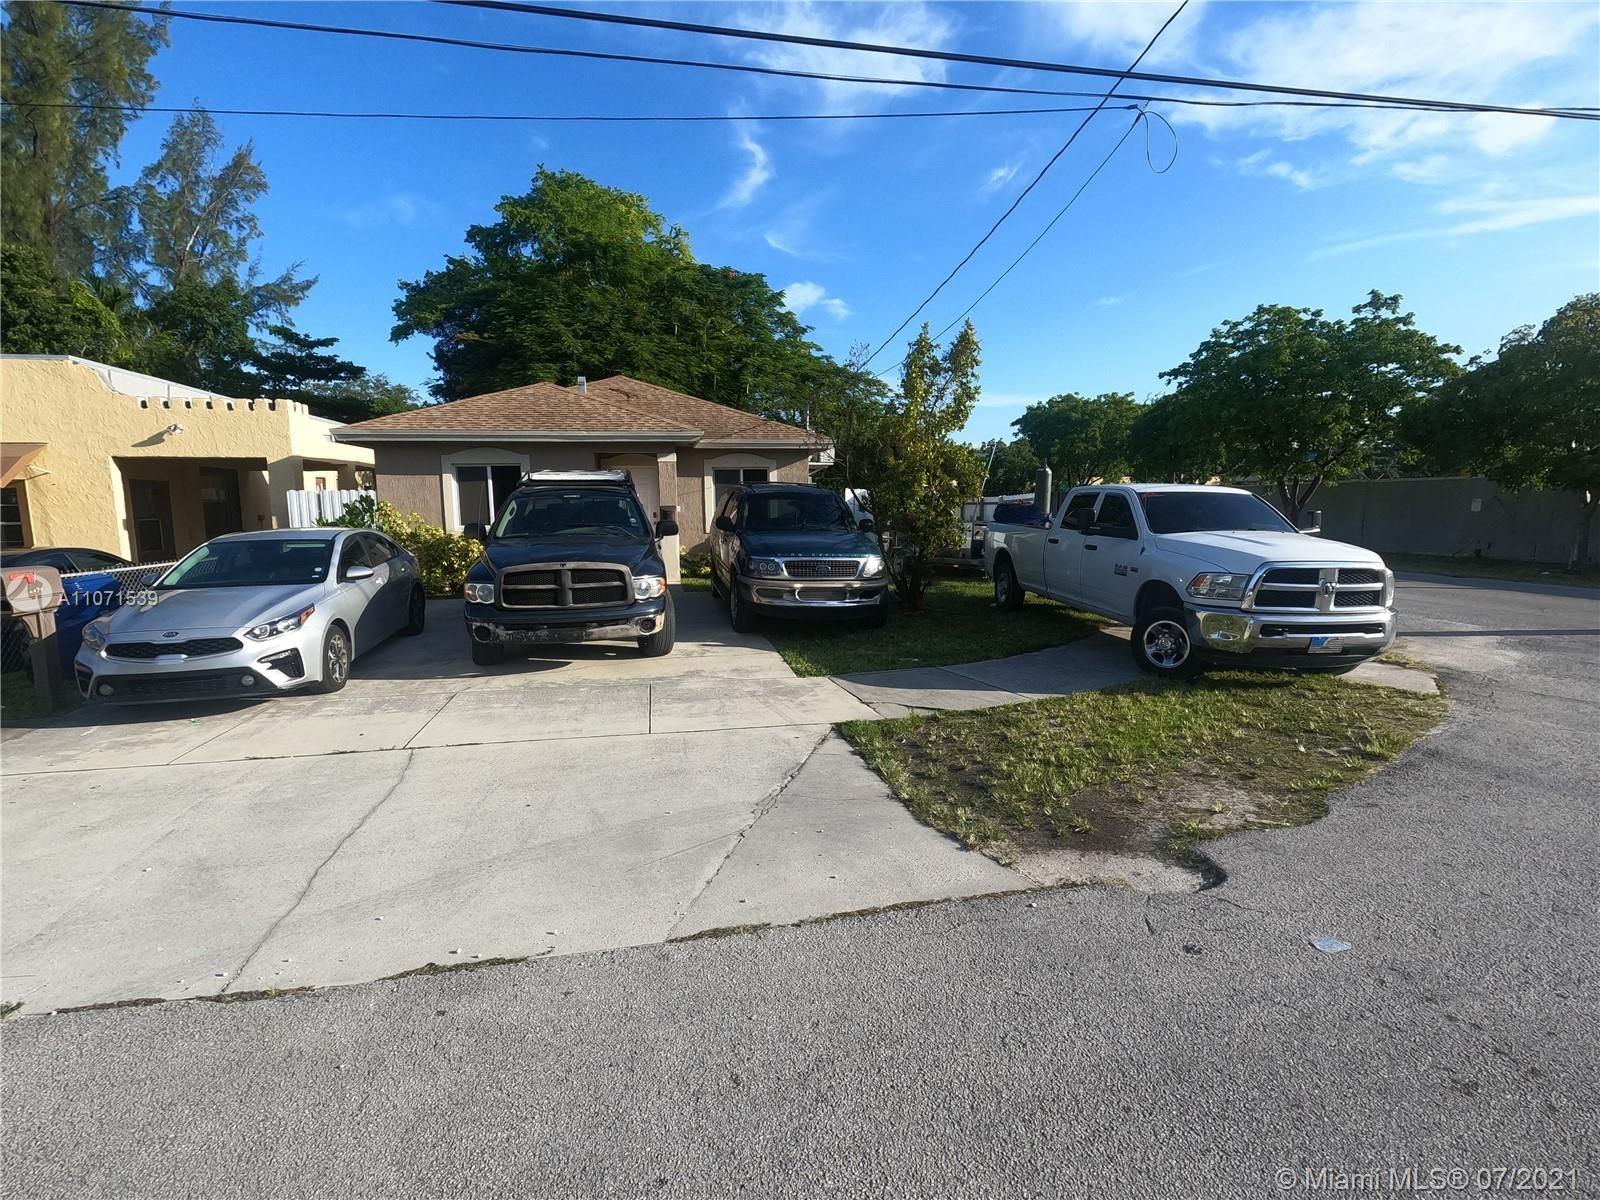 2494 NW 43rd St, Miami, FL 33142 - #: A11071539